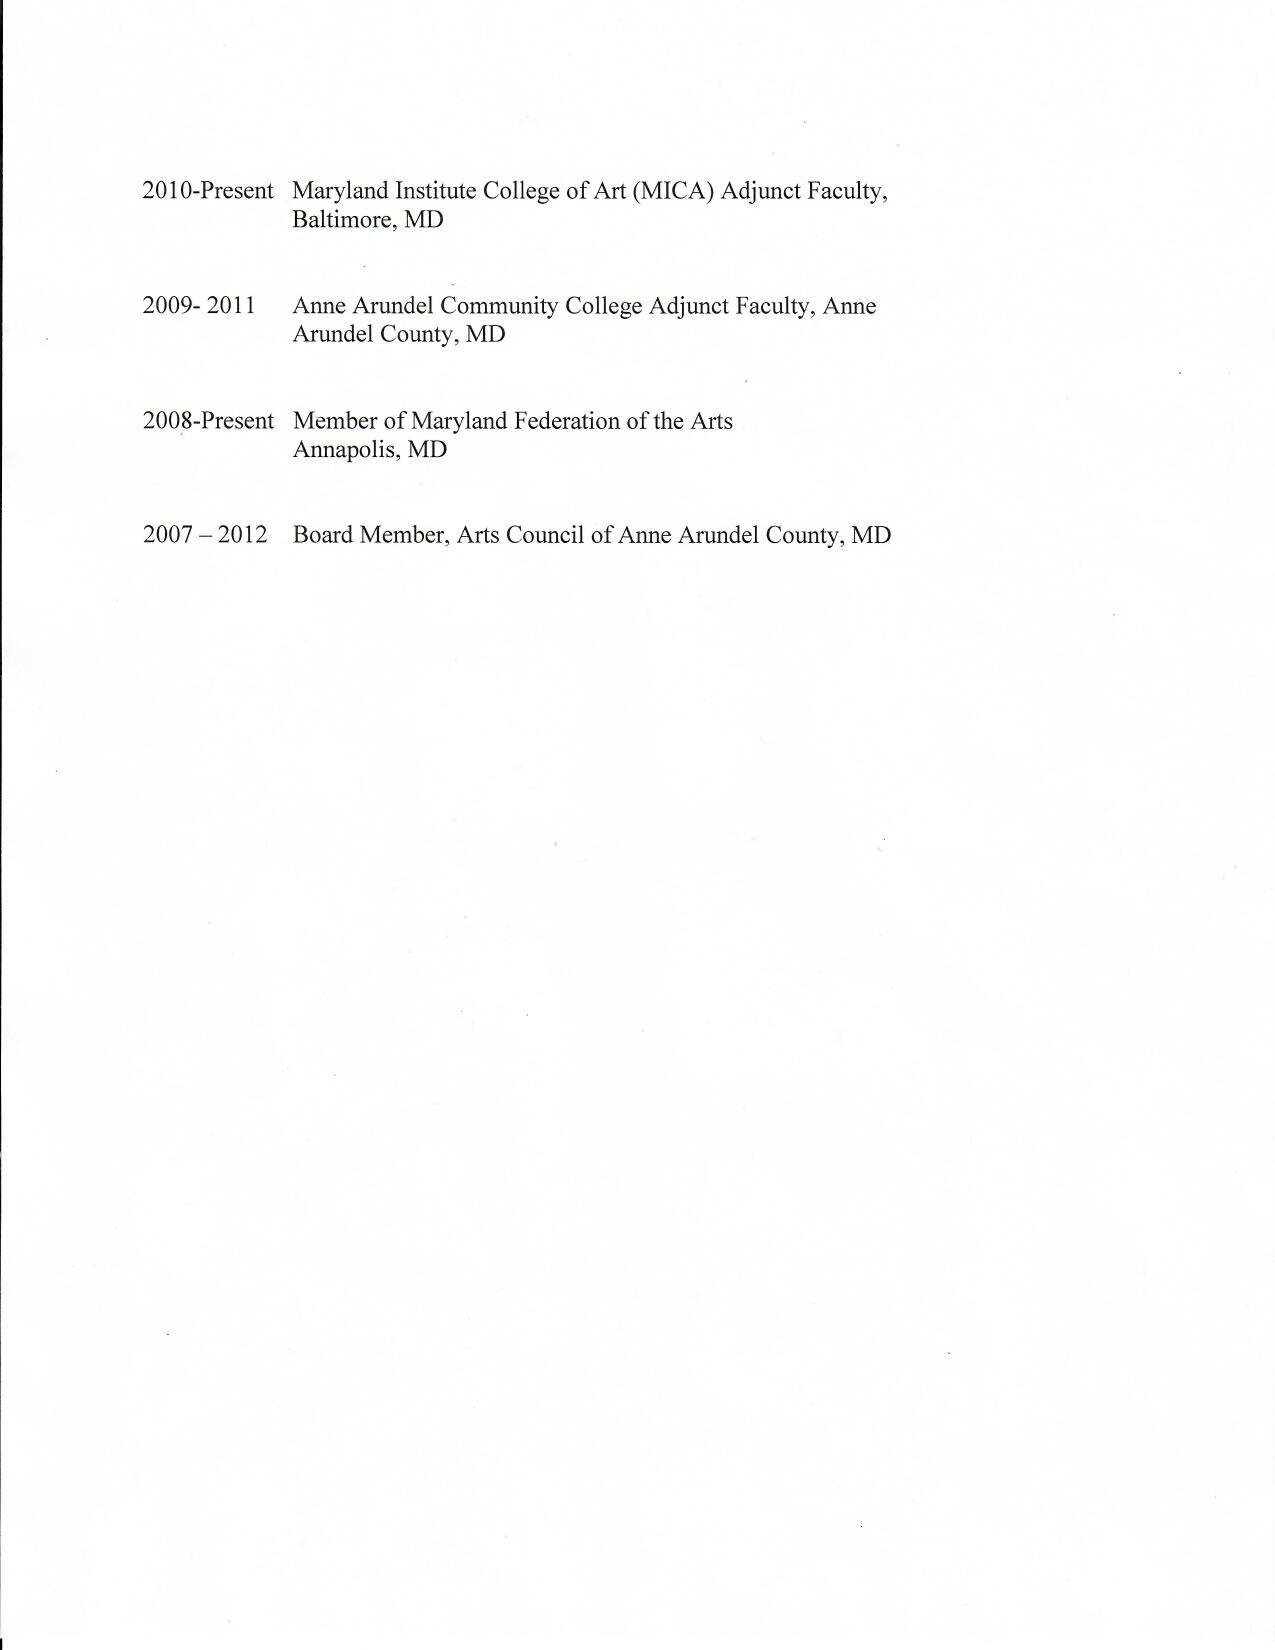 TFL Bio 7-page-001.jpg